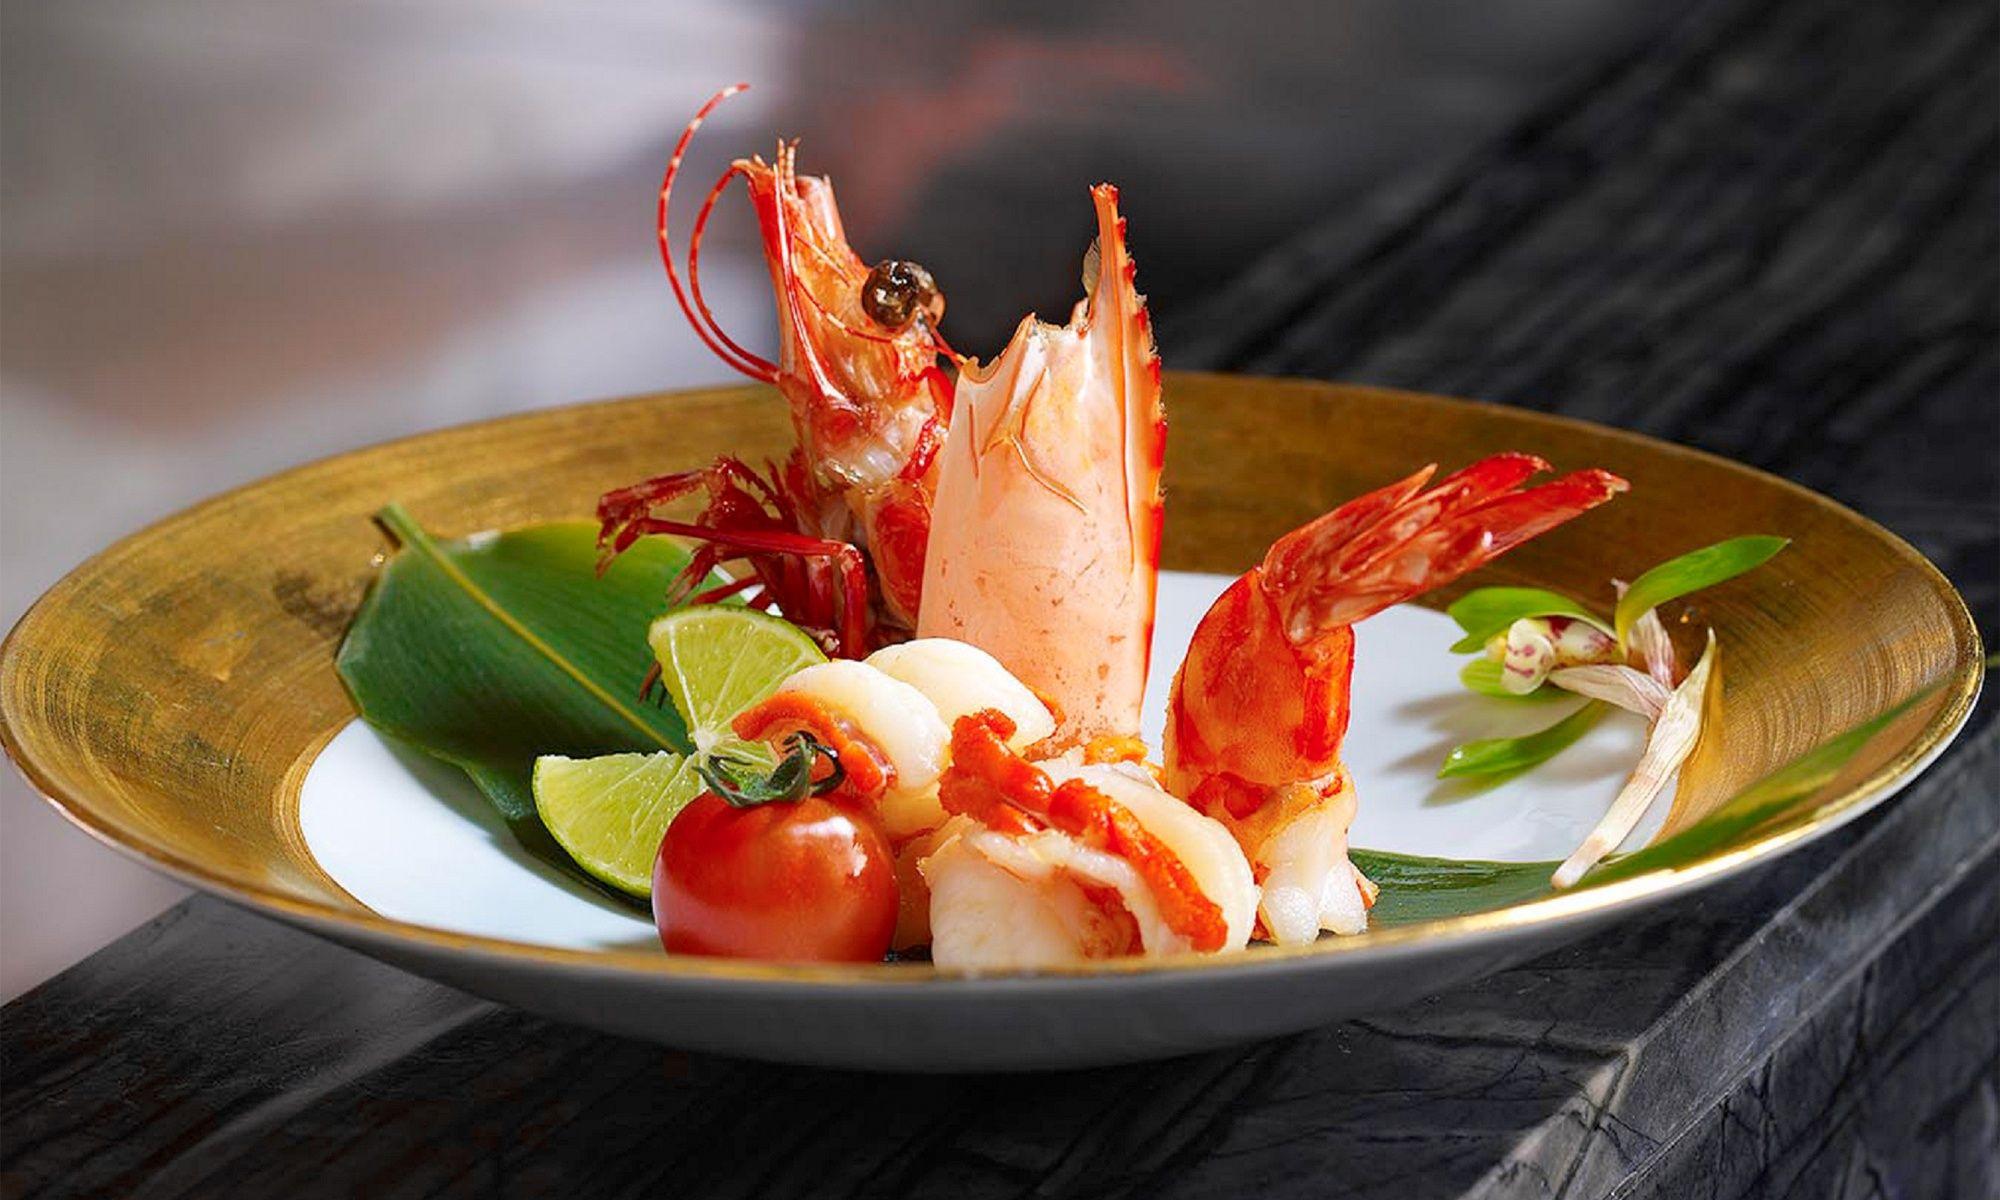 Shikigiku Japanese Restaurant Presents Premium Lunch Menu This Summer